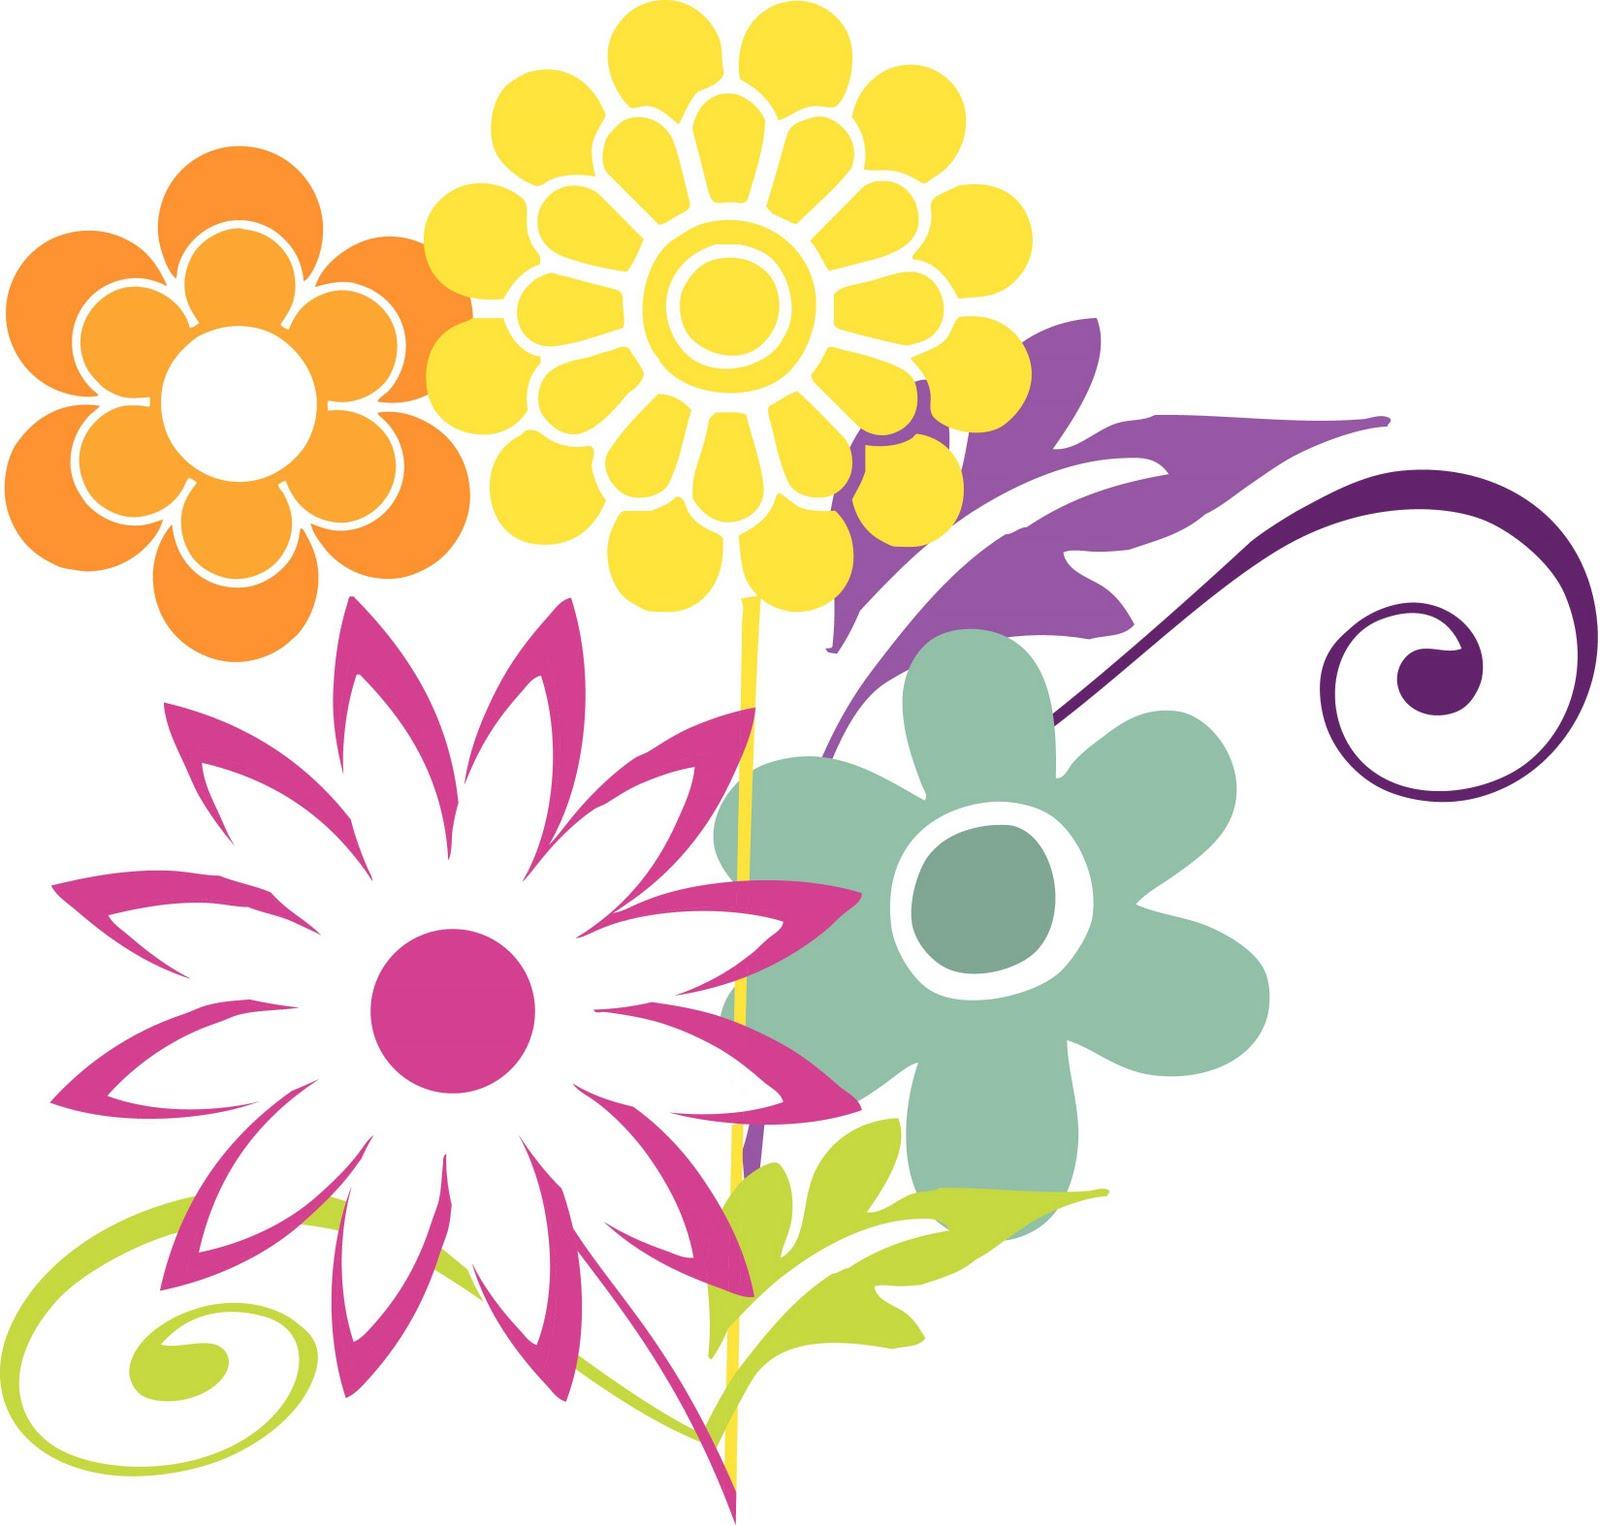 April flowers clip art png free download April flowers clip art clipart 5 – Gclipart.com png free download